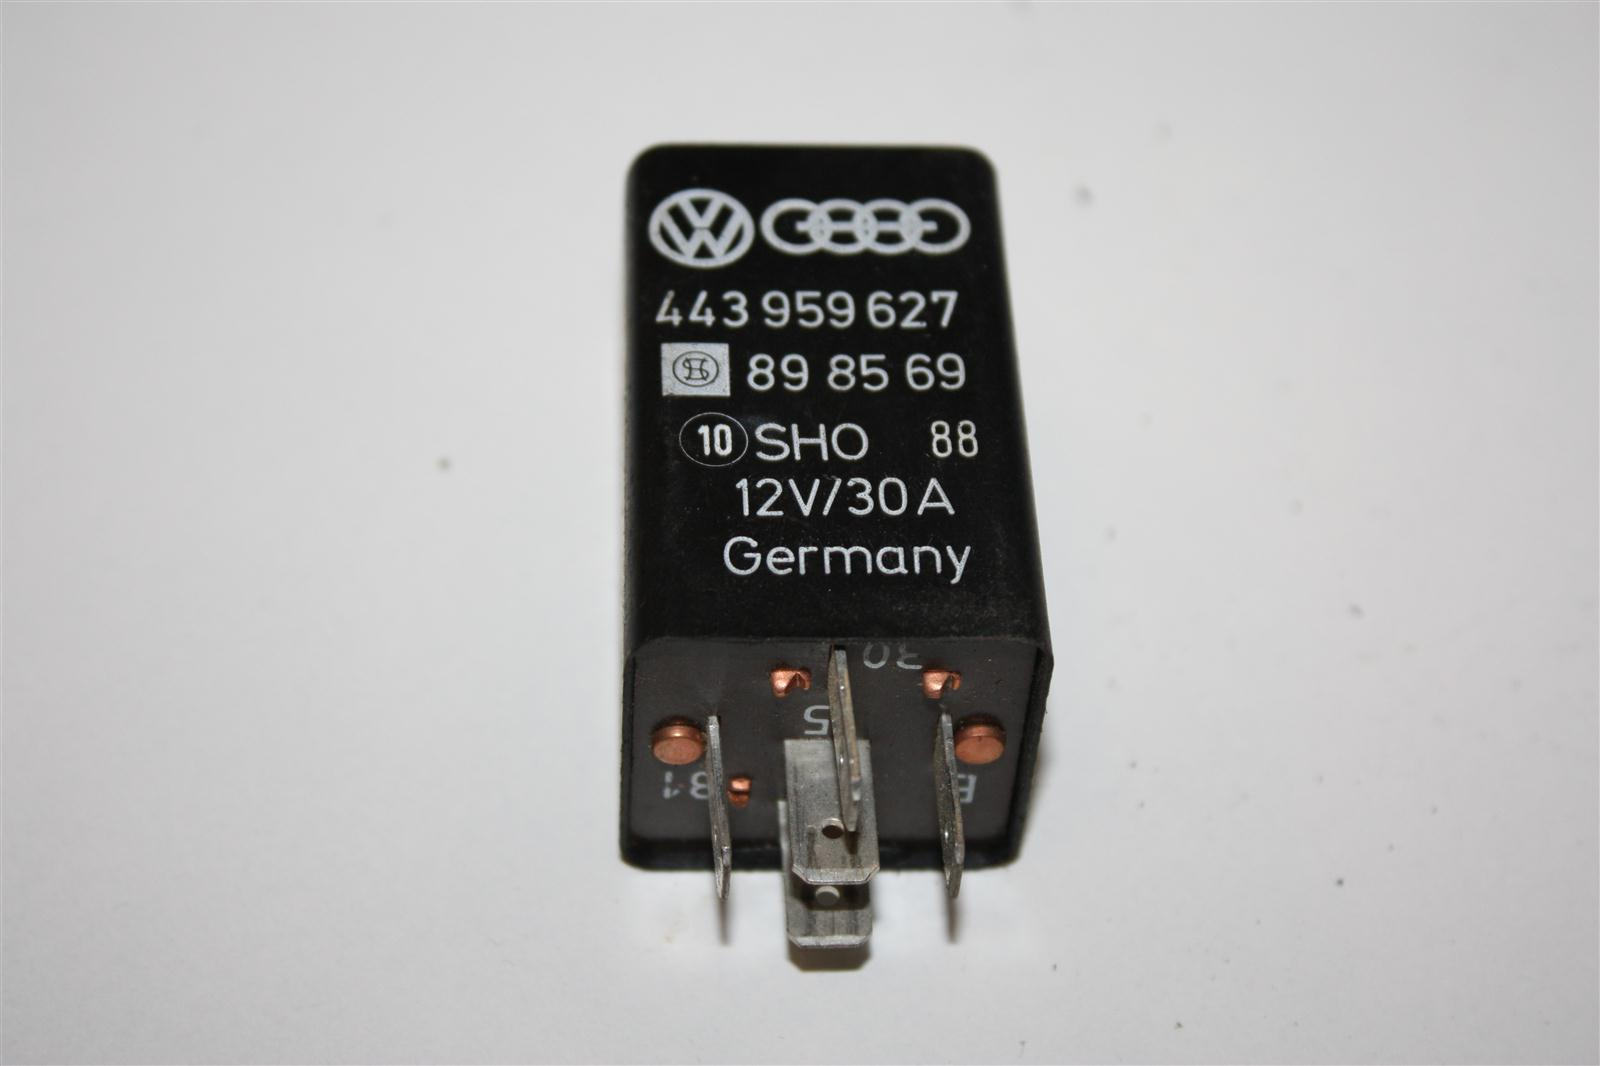 Audi/VW V8 D11 Relais 269 Heckscheibenheizung 443959627